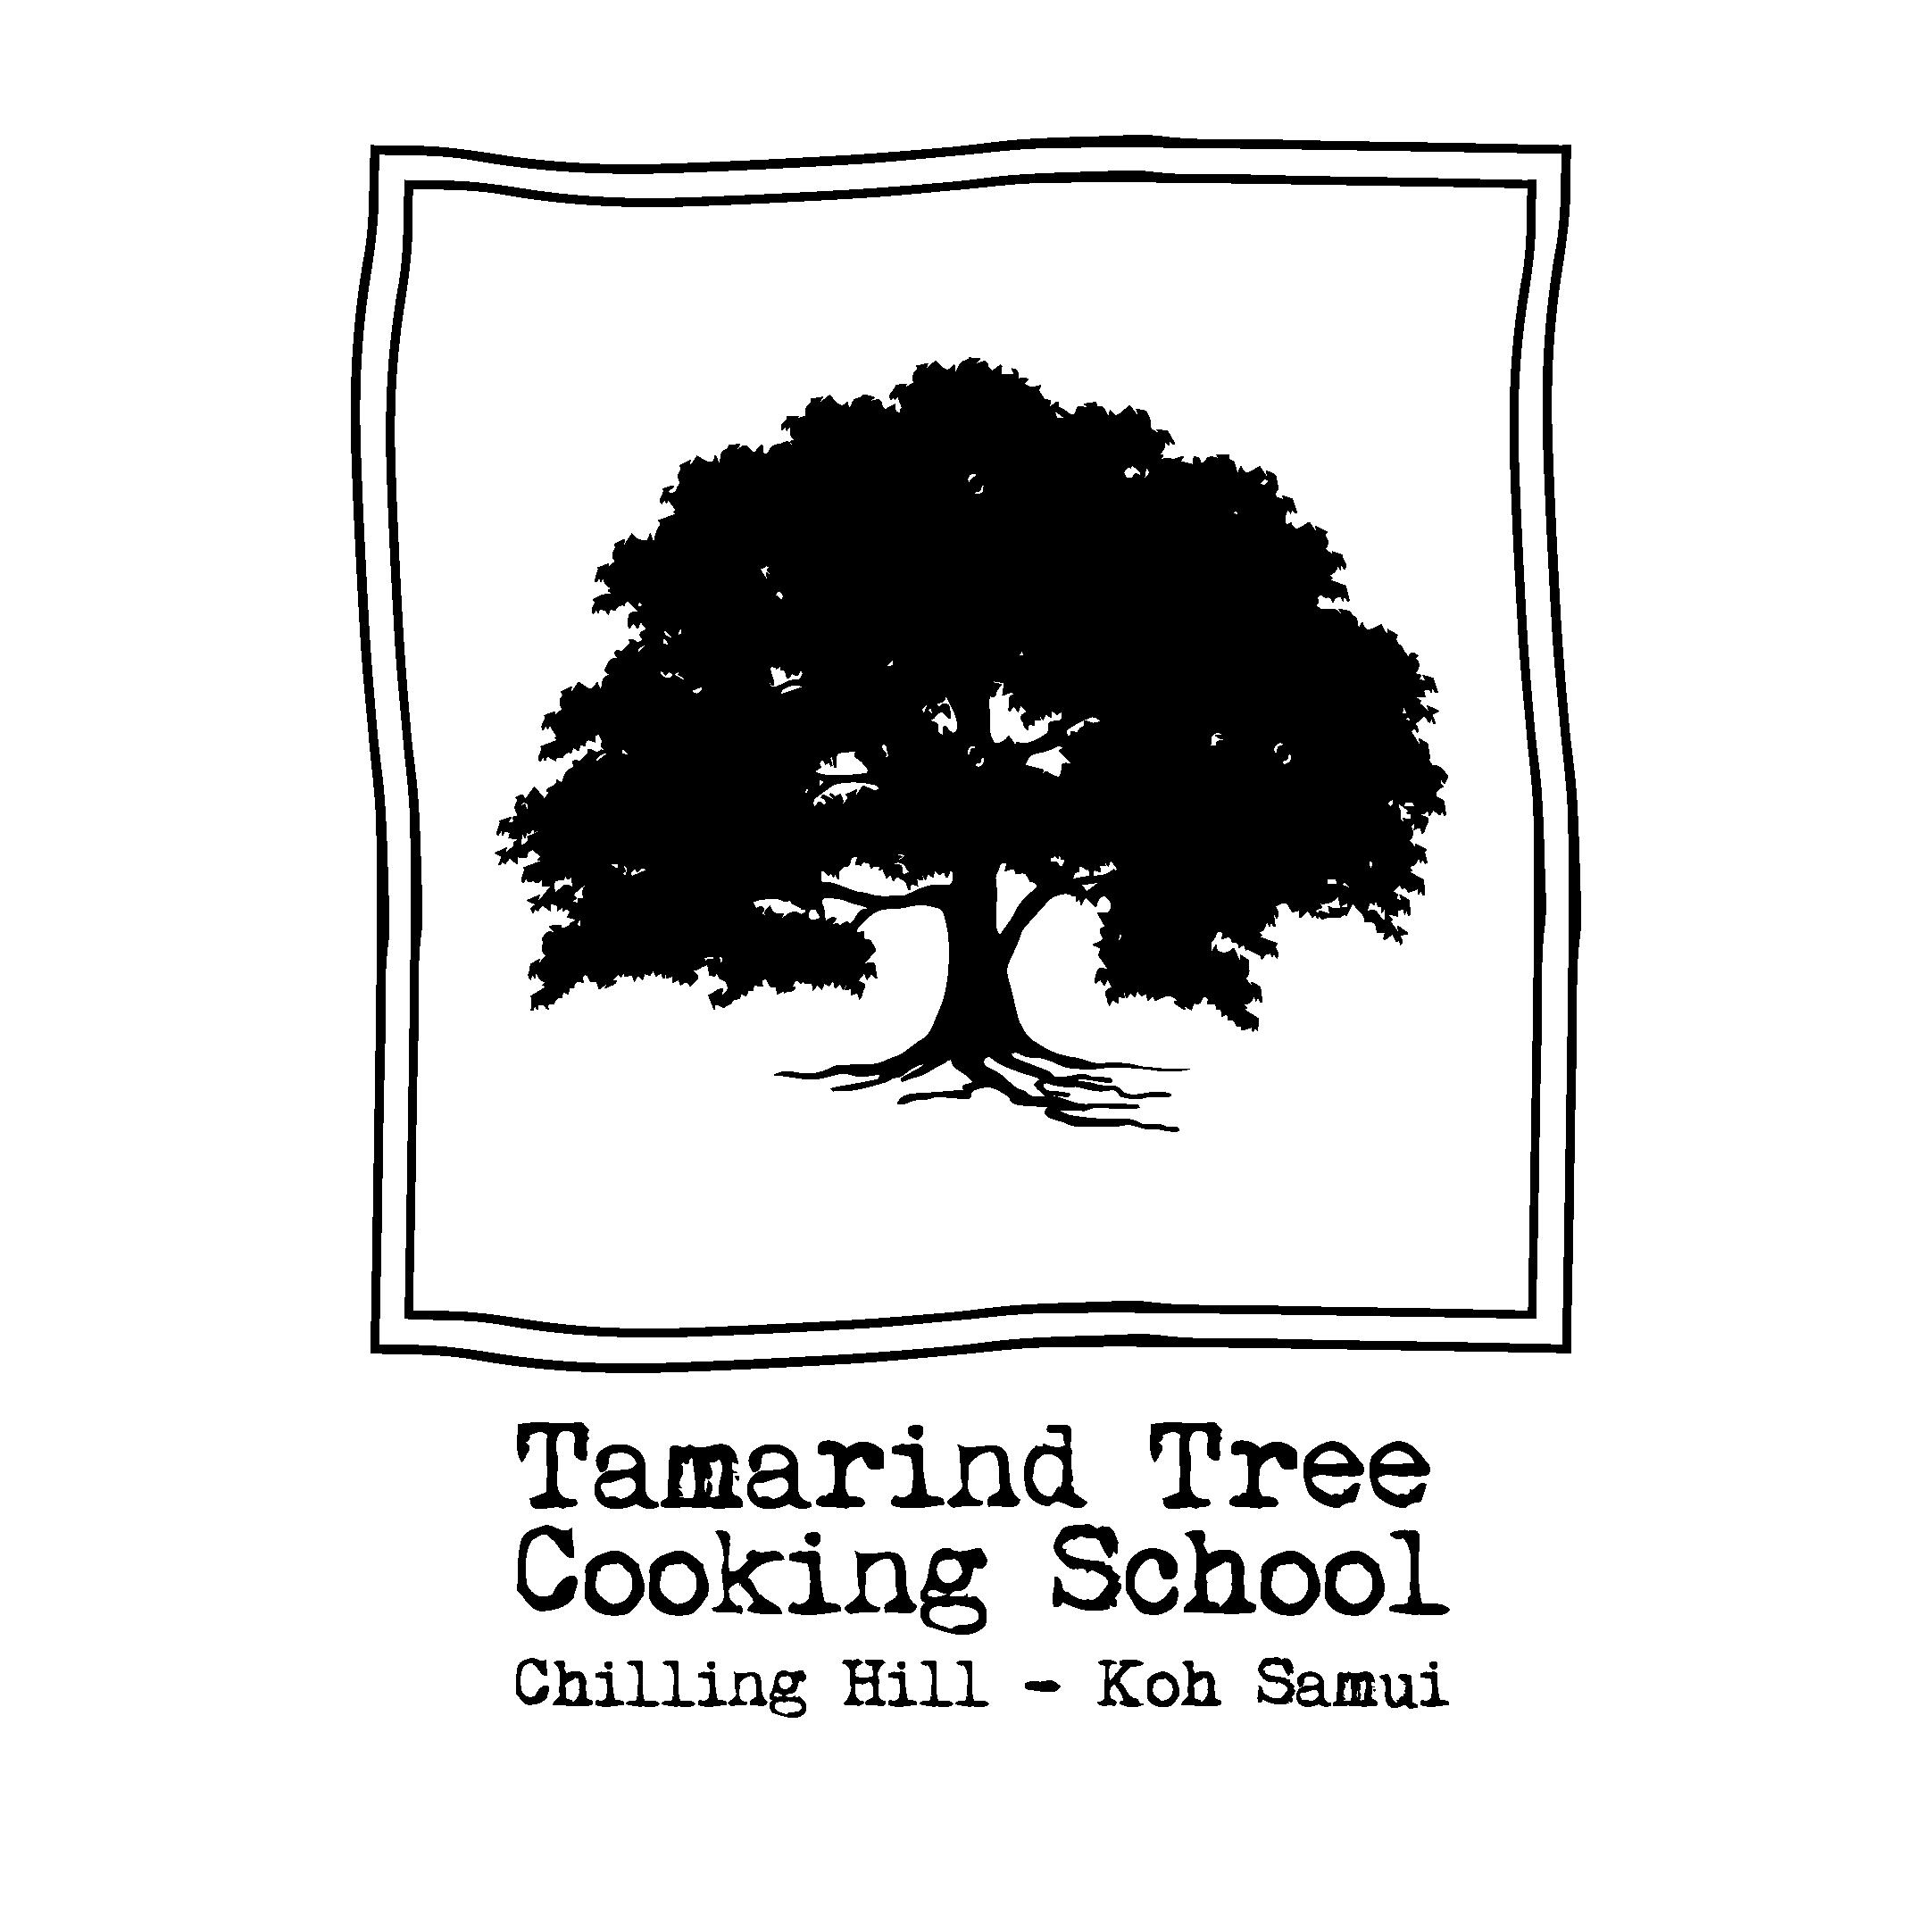 Tamarind Tree Cooking School